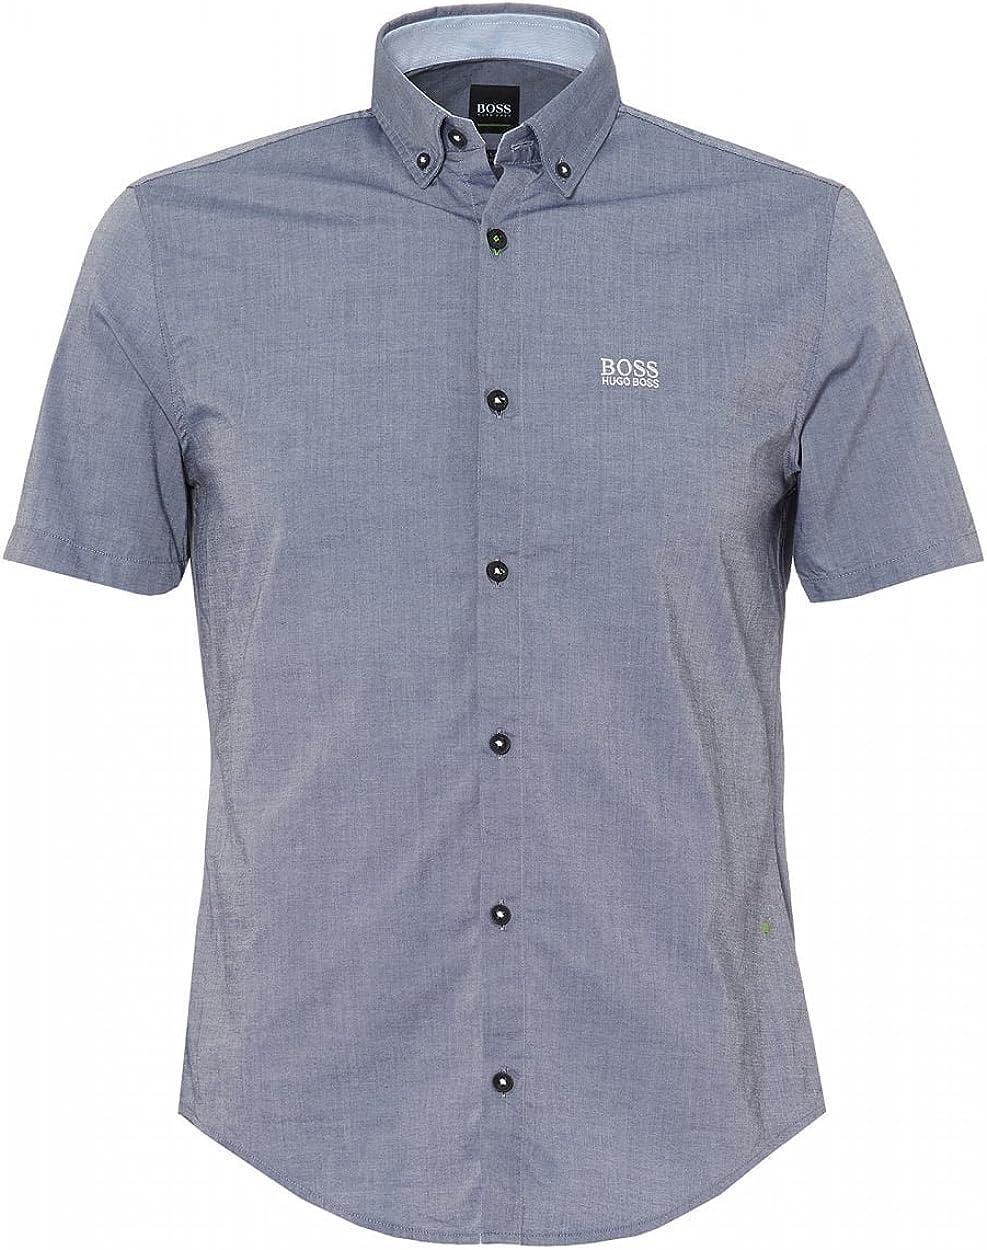 BOSS Biada R Camisa para Hombre